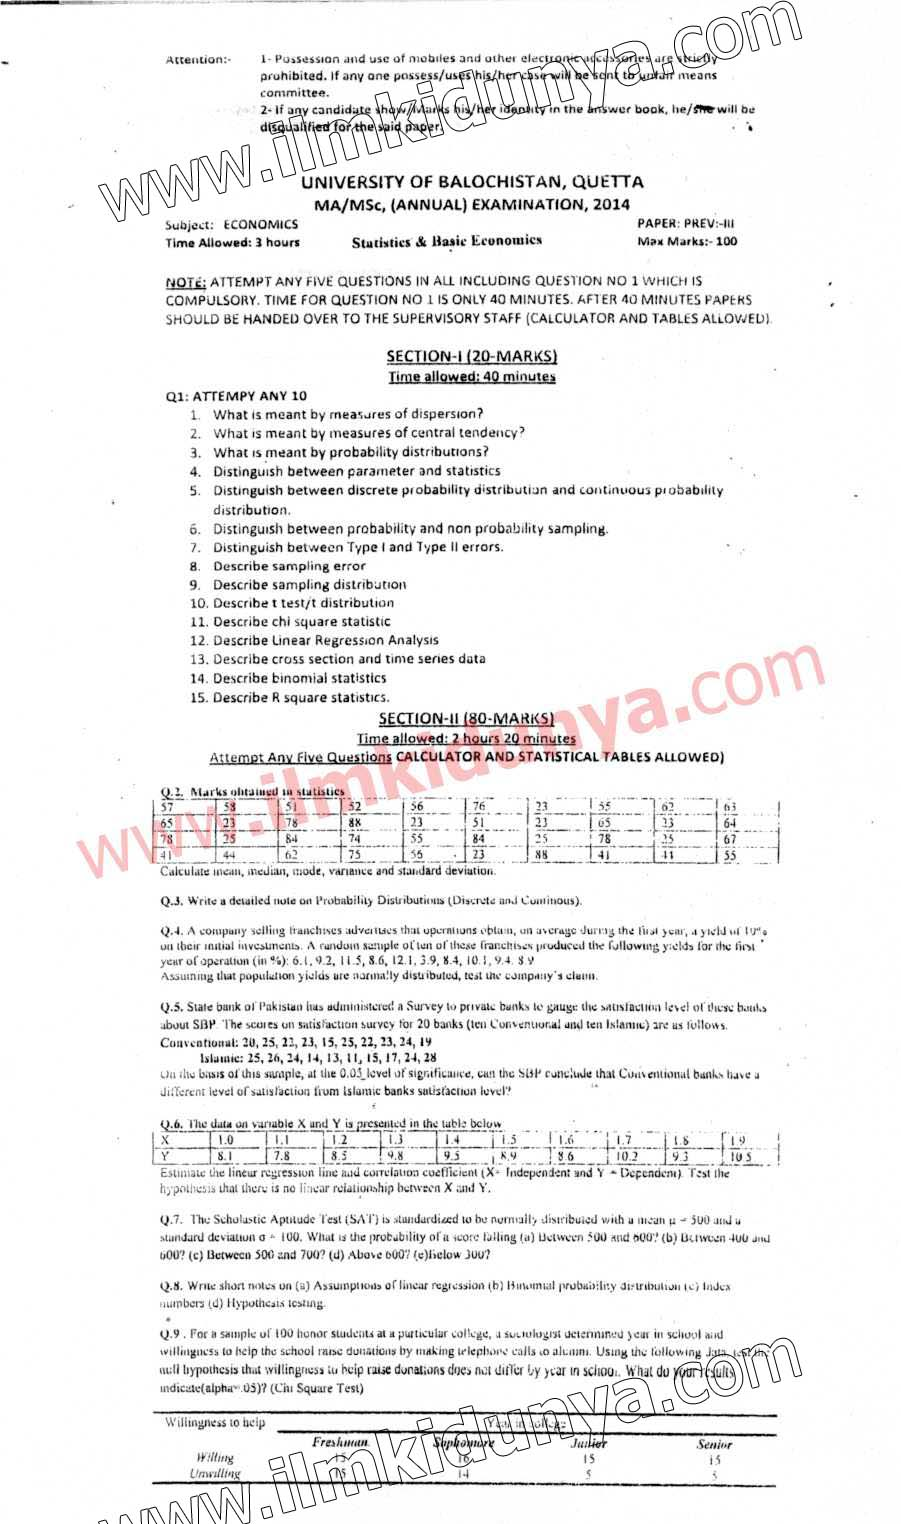 University of Balochistan MA MSc Economics Past Paper 2014